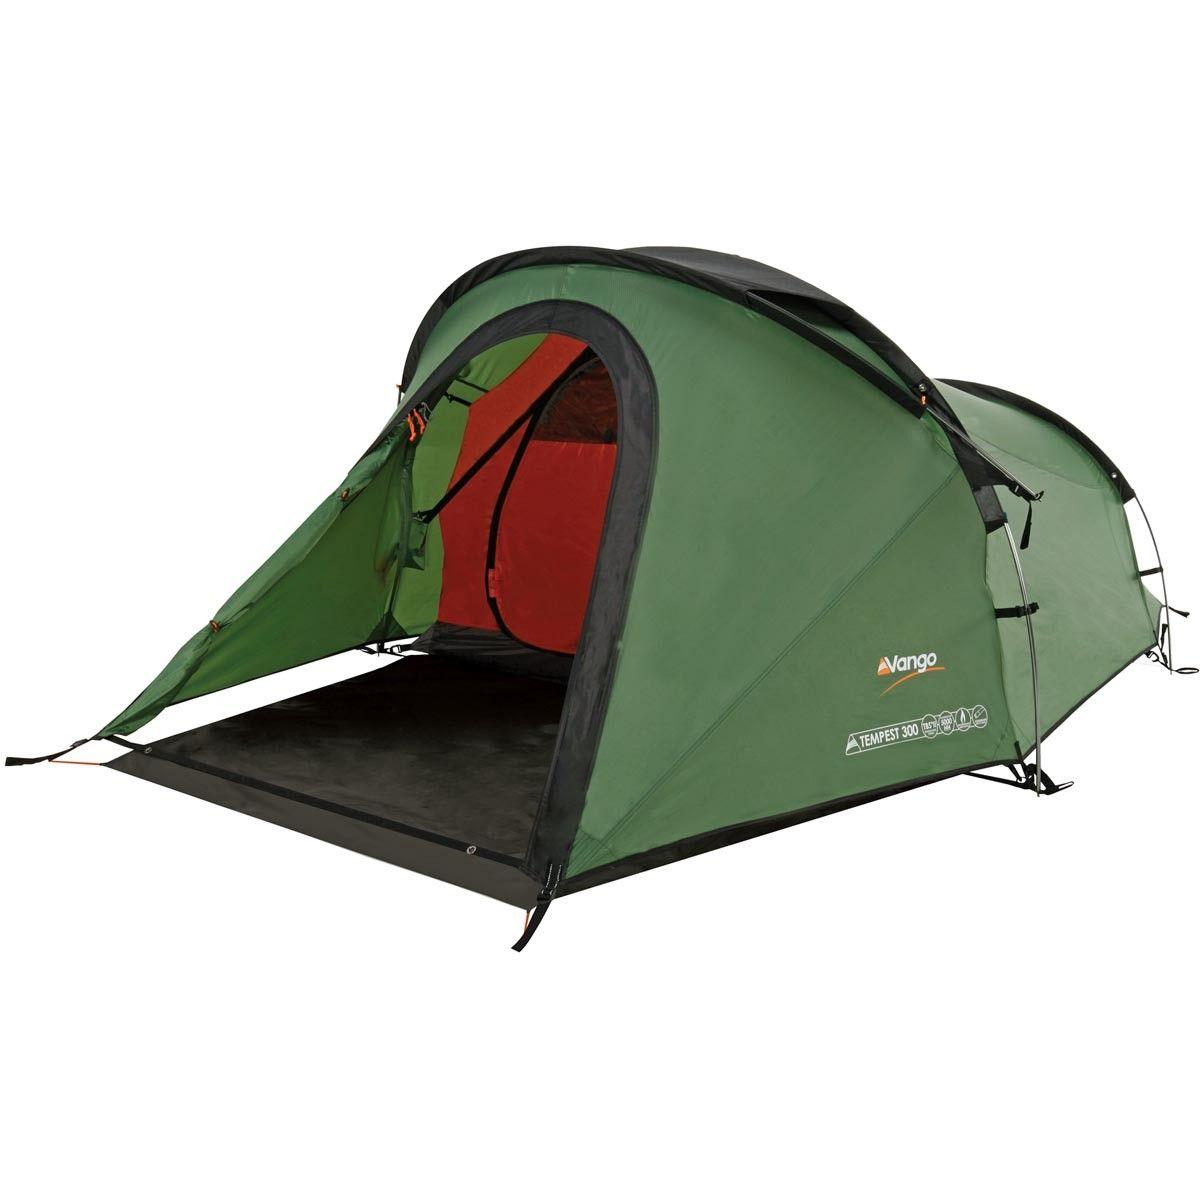 Vango Tempest 300 Tent £125 3.48kg  sc 1 st  Pinterest & Vango Tempest 300 Tent £125 3.48kg | Camping | Pinterest | Tents ...